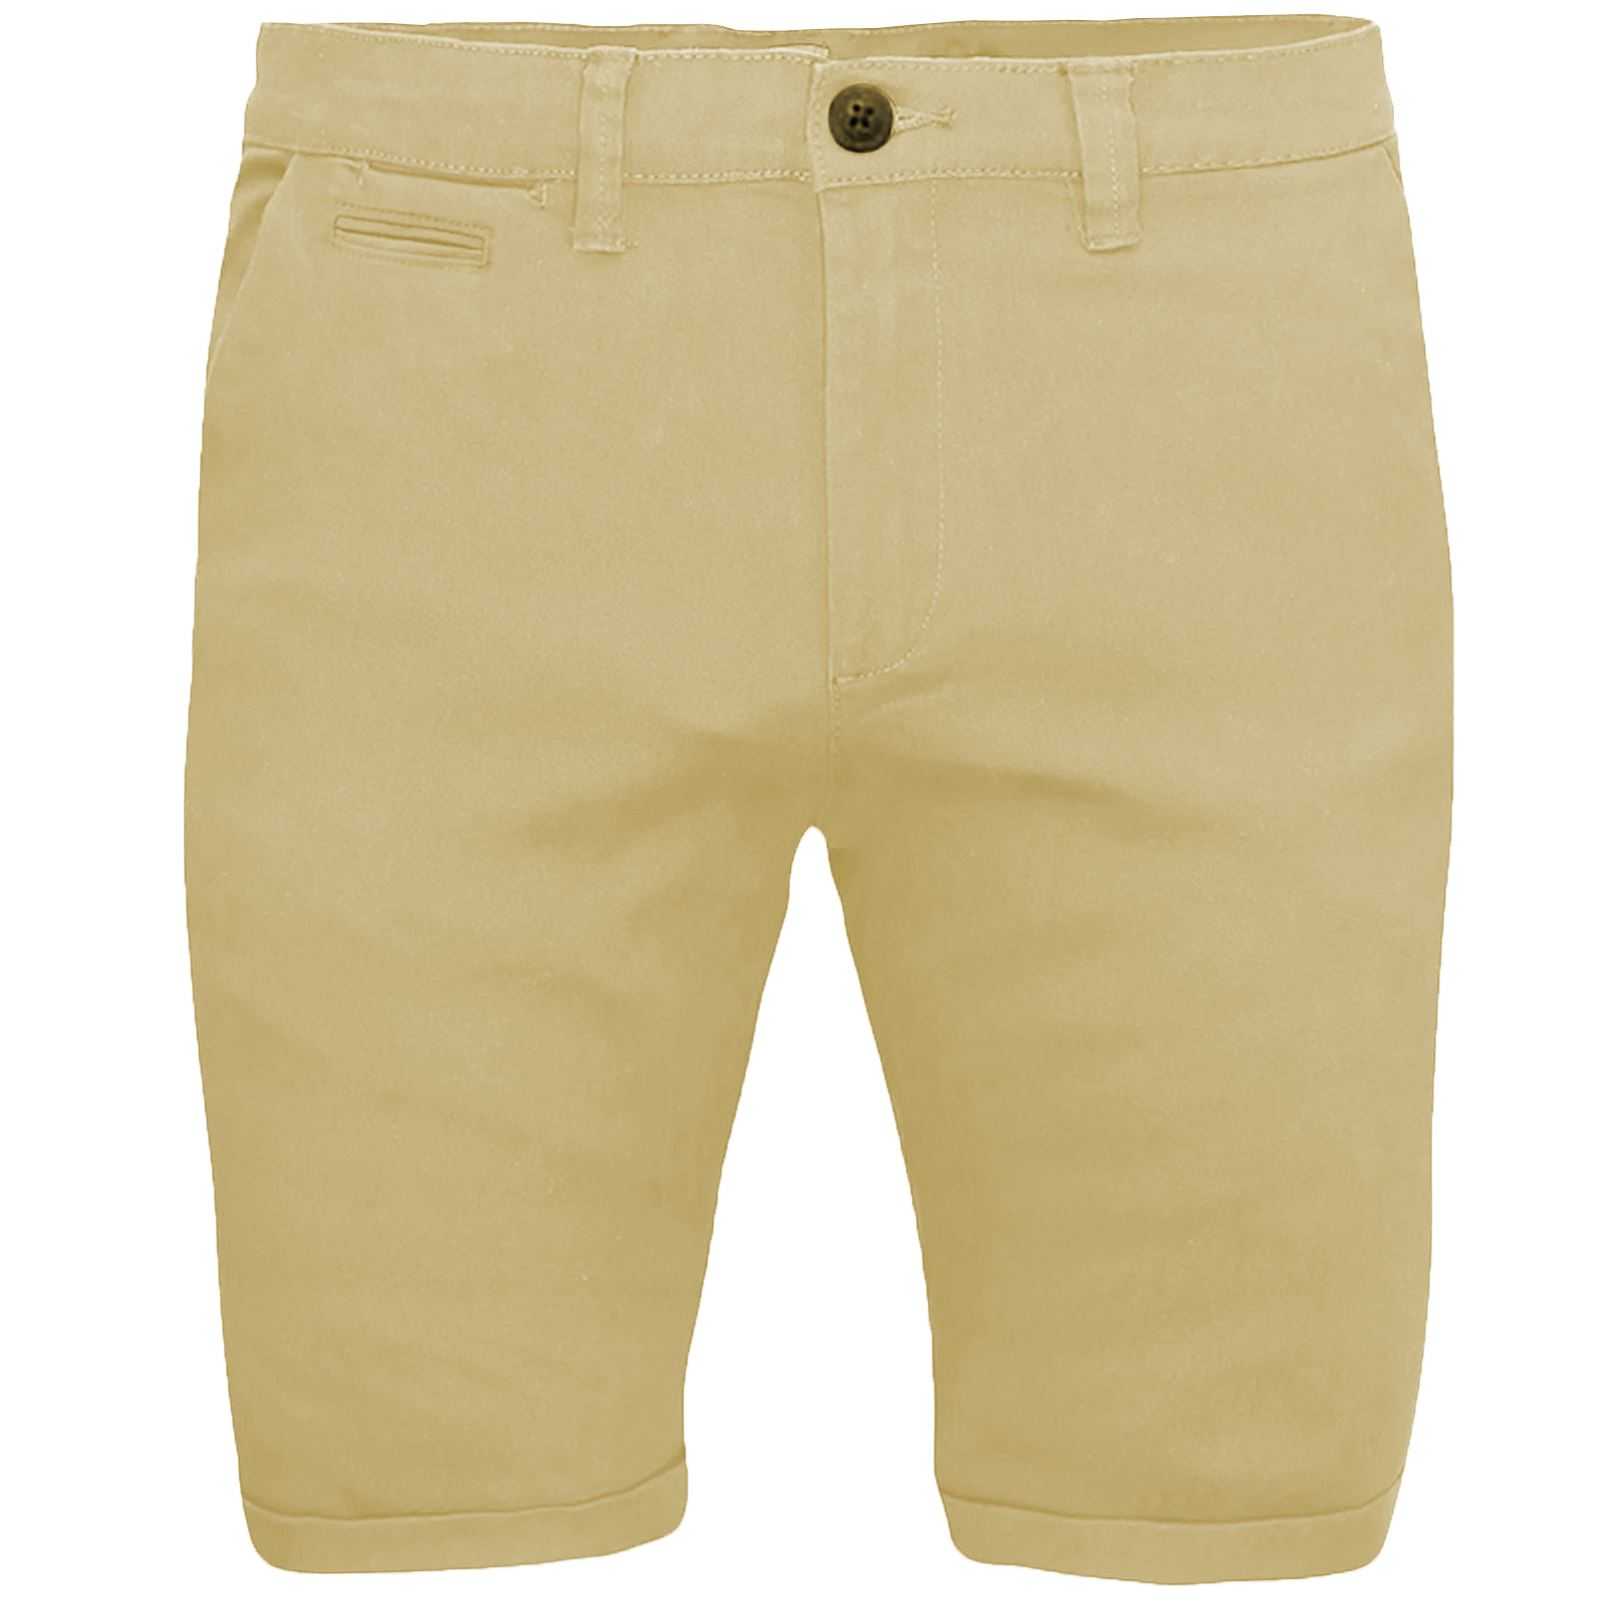 mens stretch shorts chino spandex combat half pant branded k